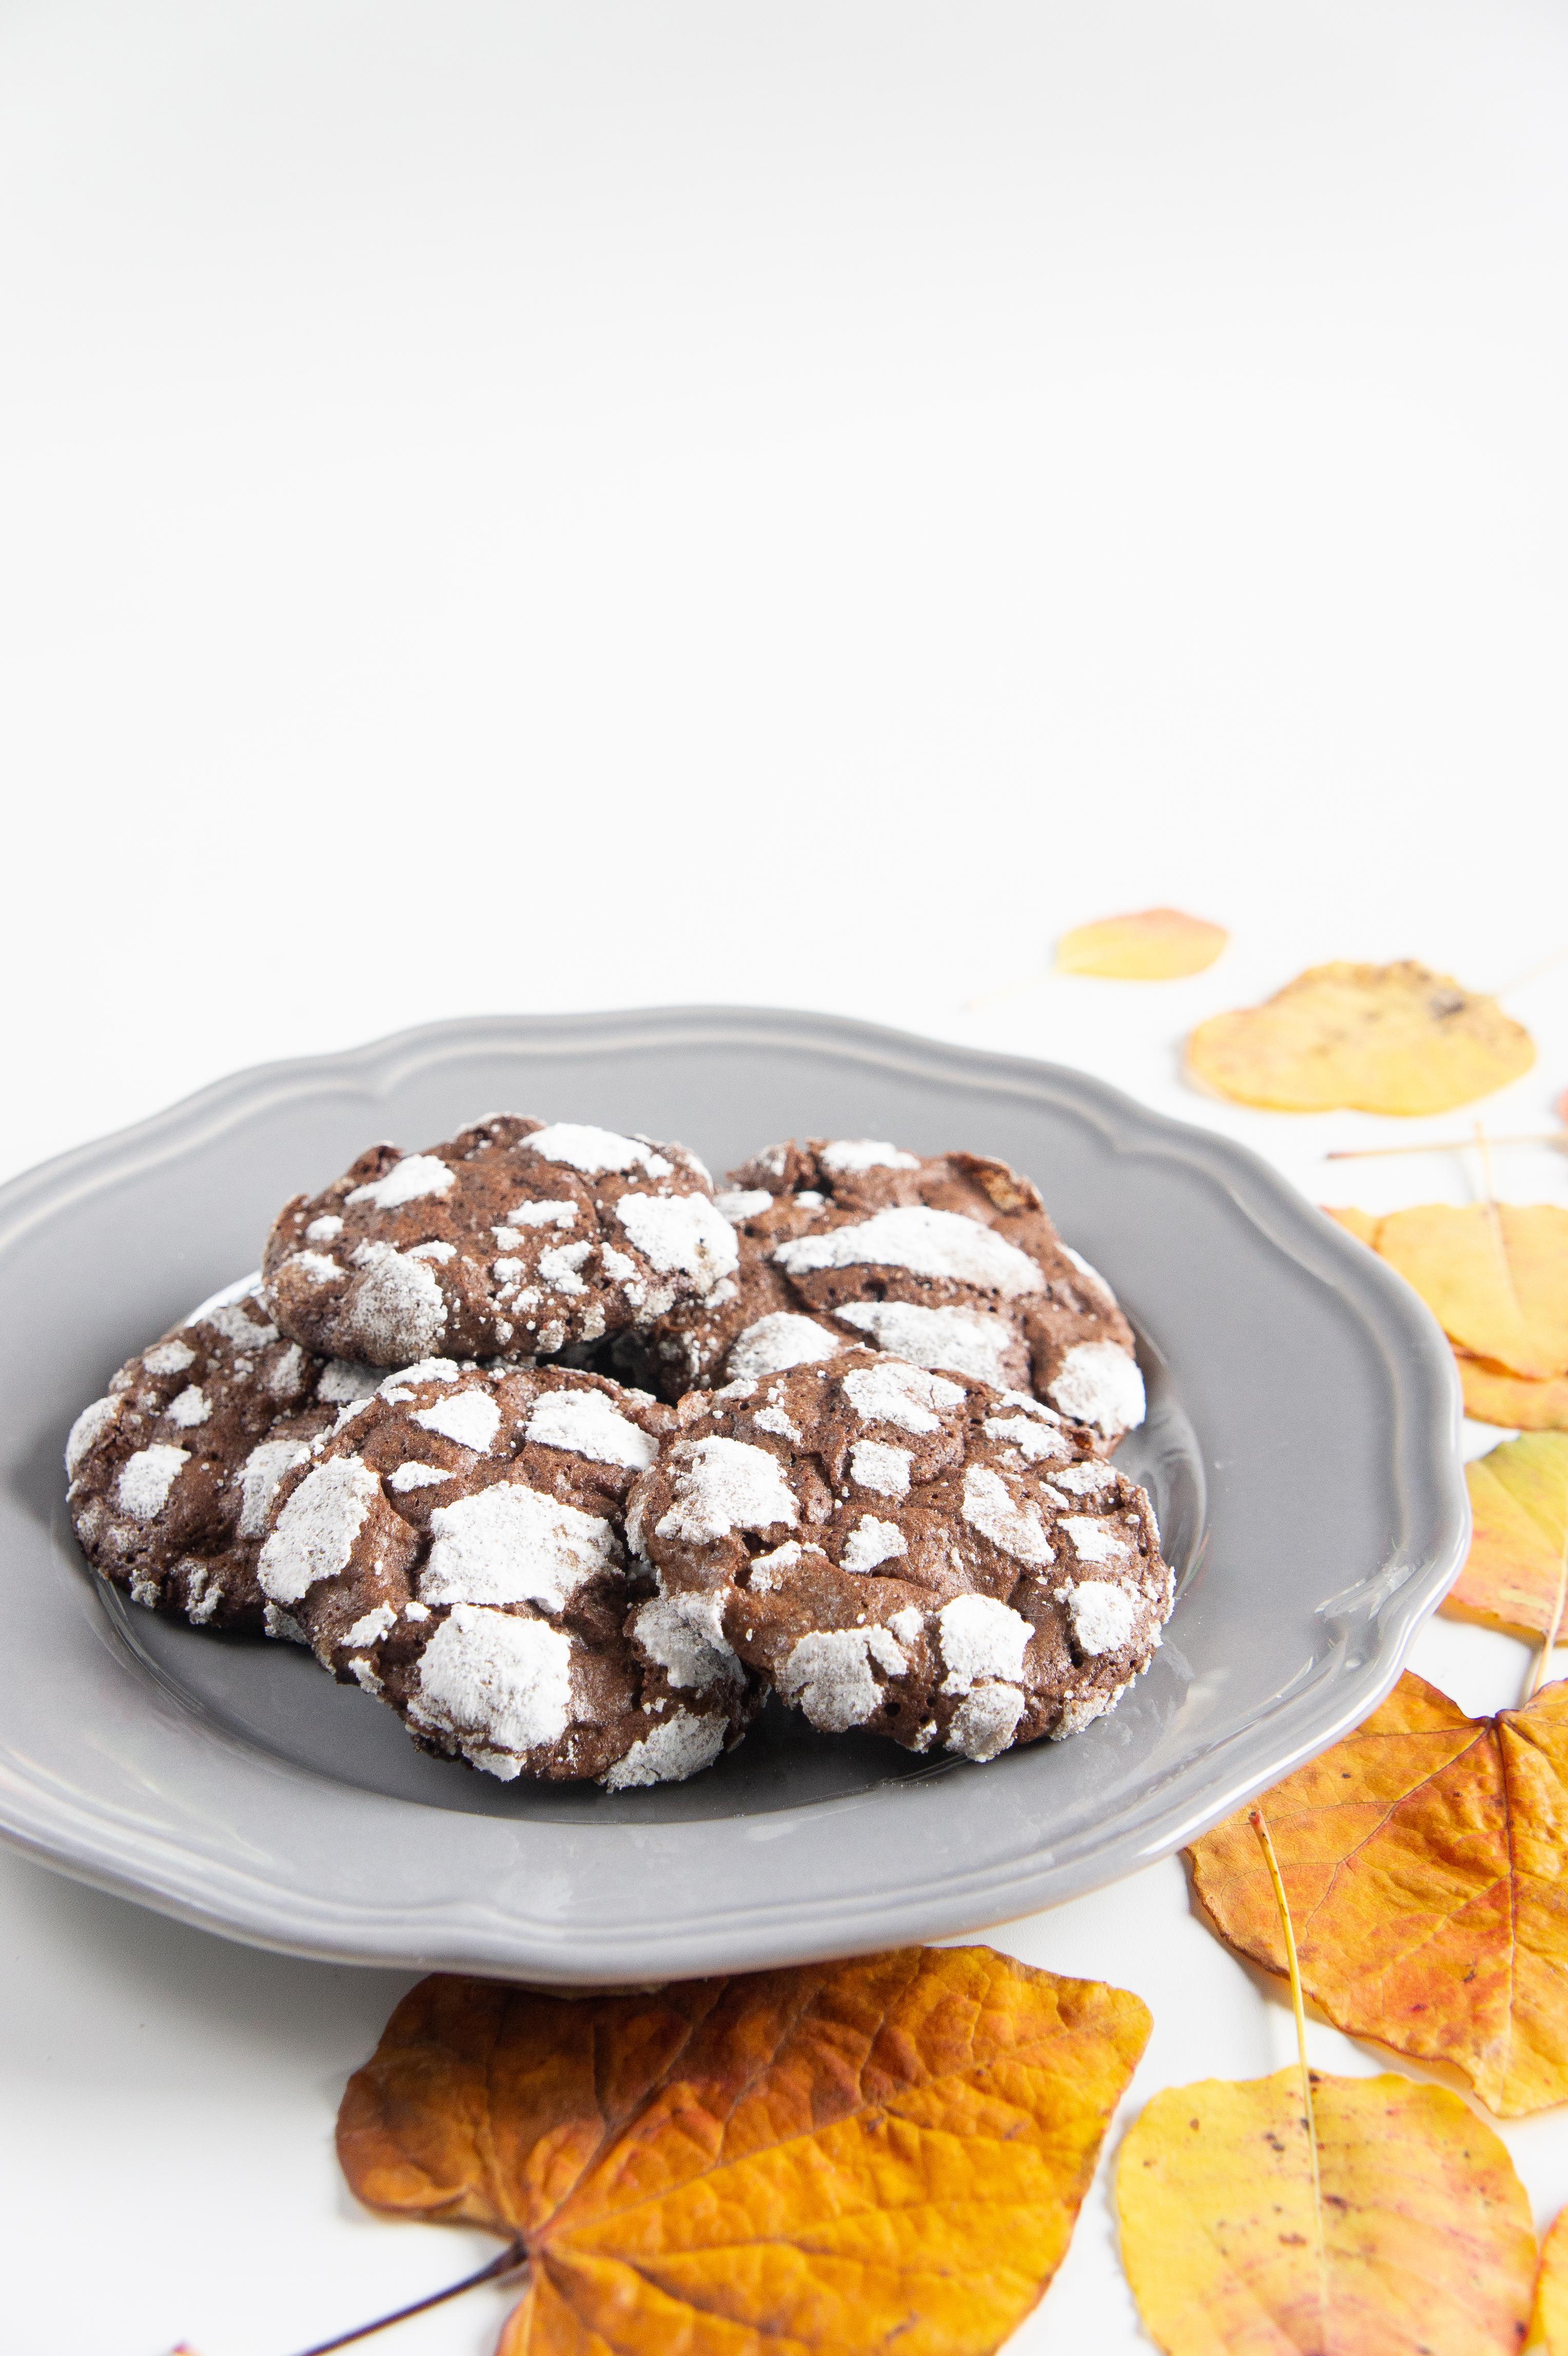 biscotti-craquelés-al-cioccolato